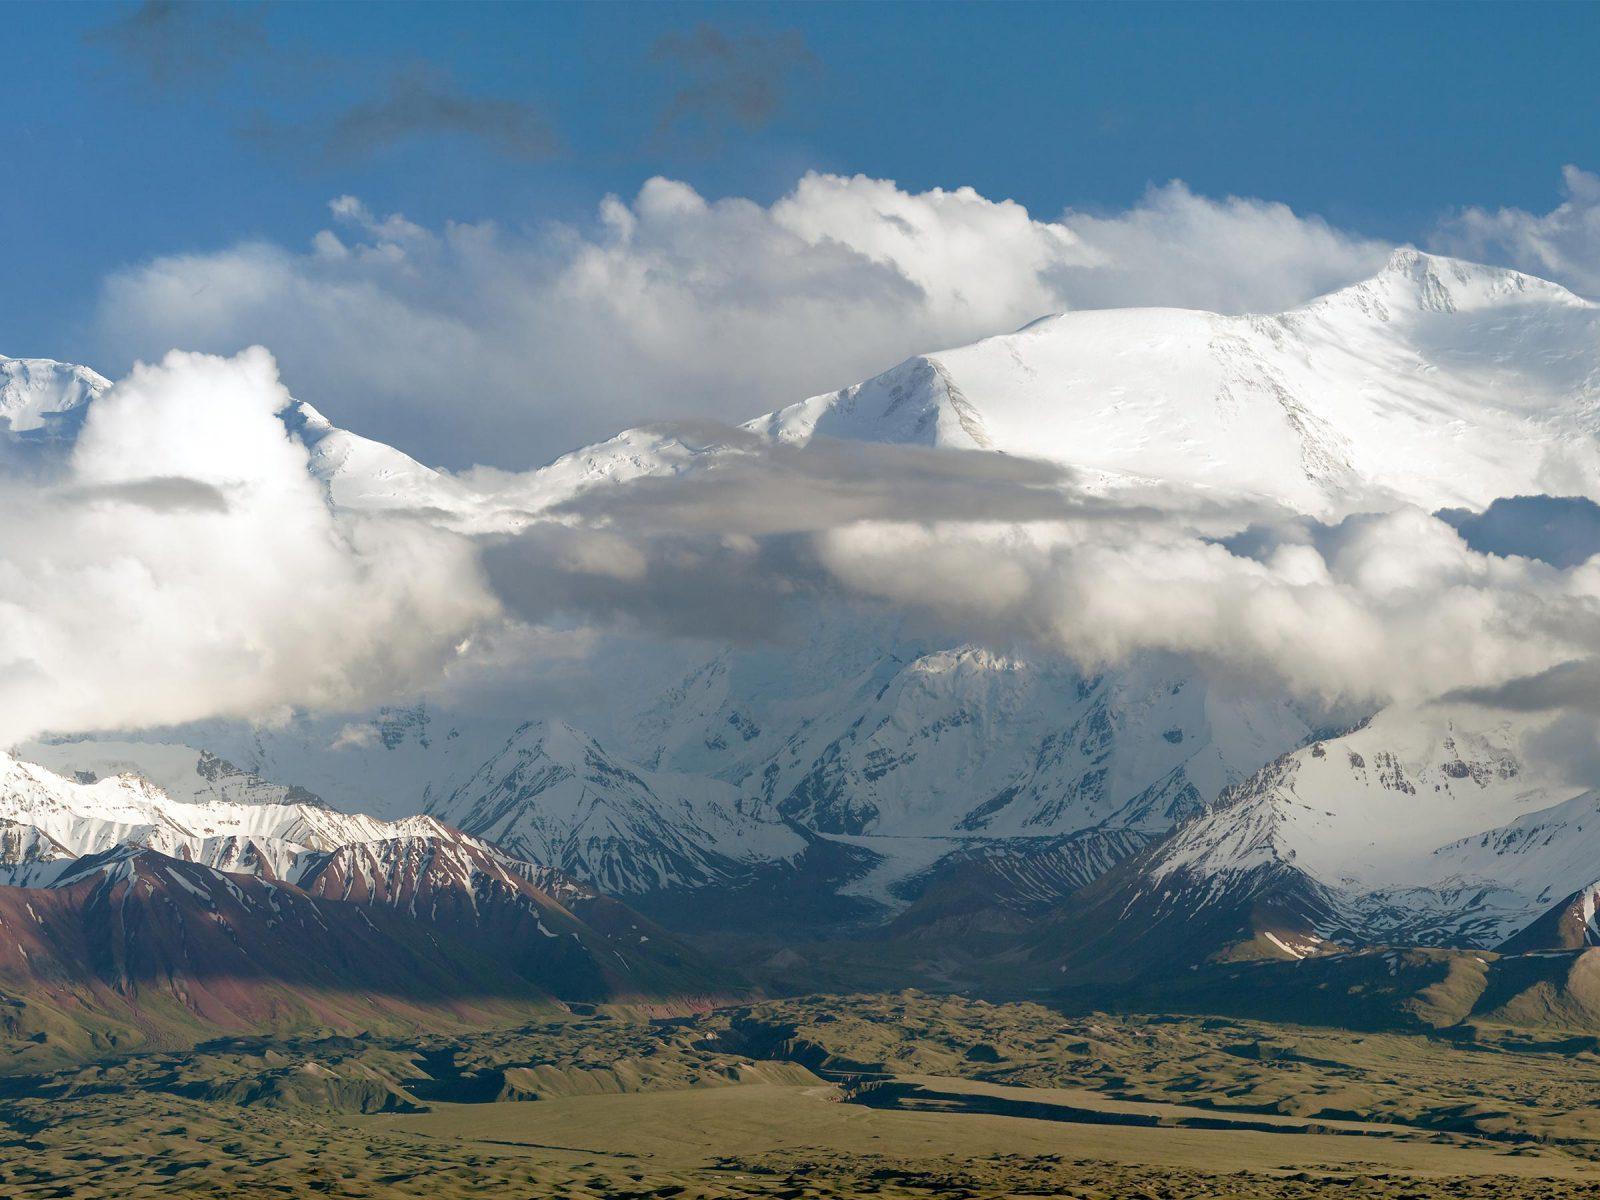 Panoramic view of Lenin Peak from Alay Range. Photograph © iStock.com/Daniel Prudek.